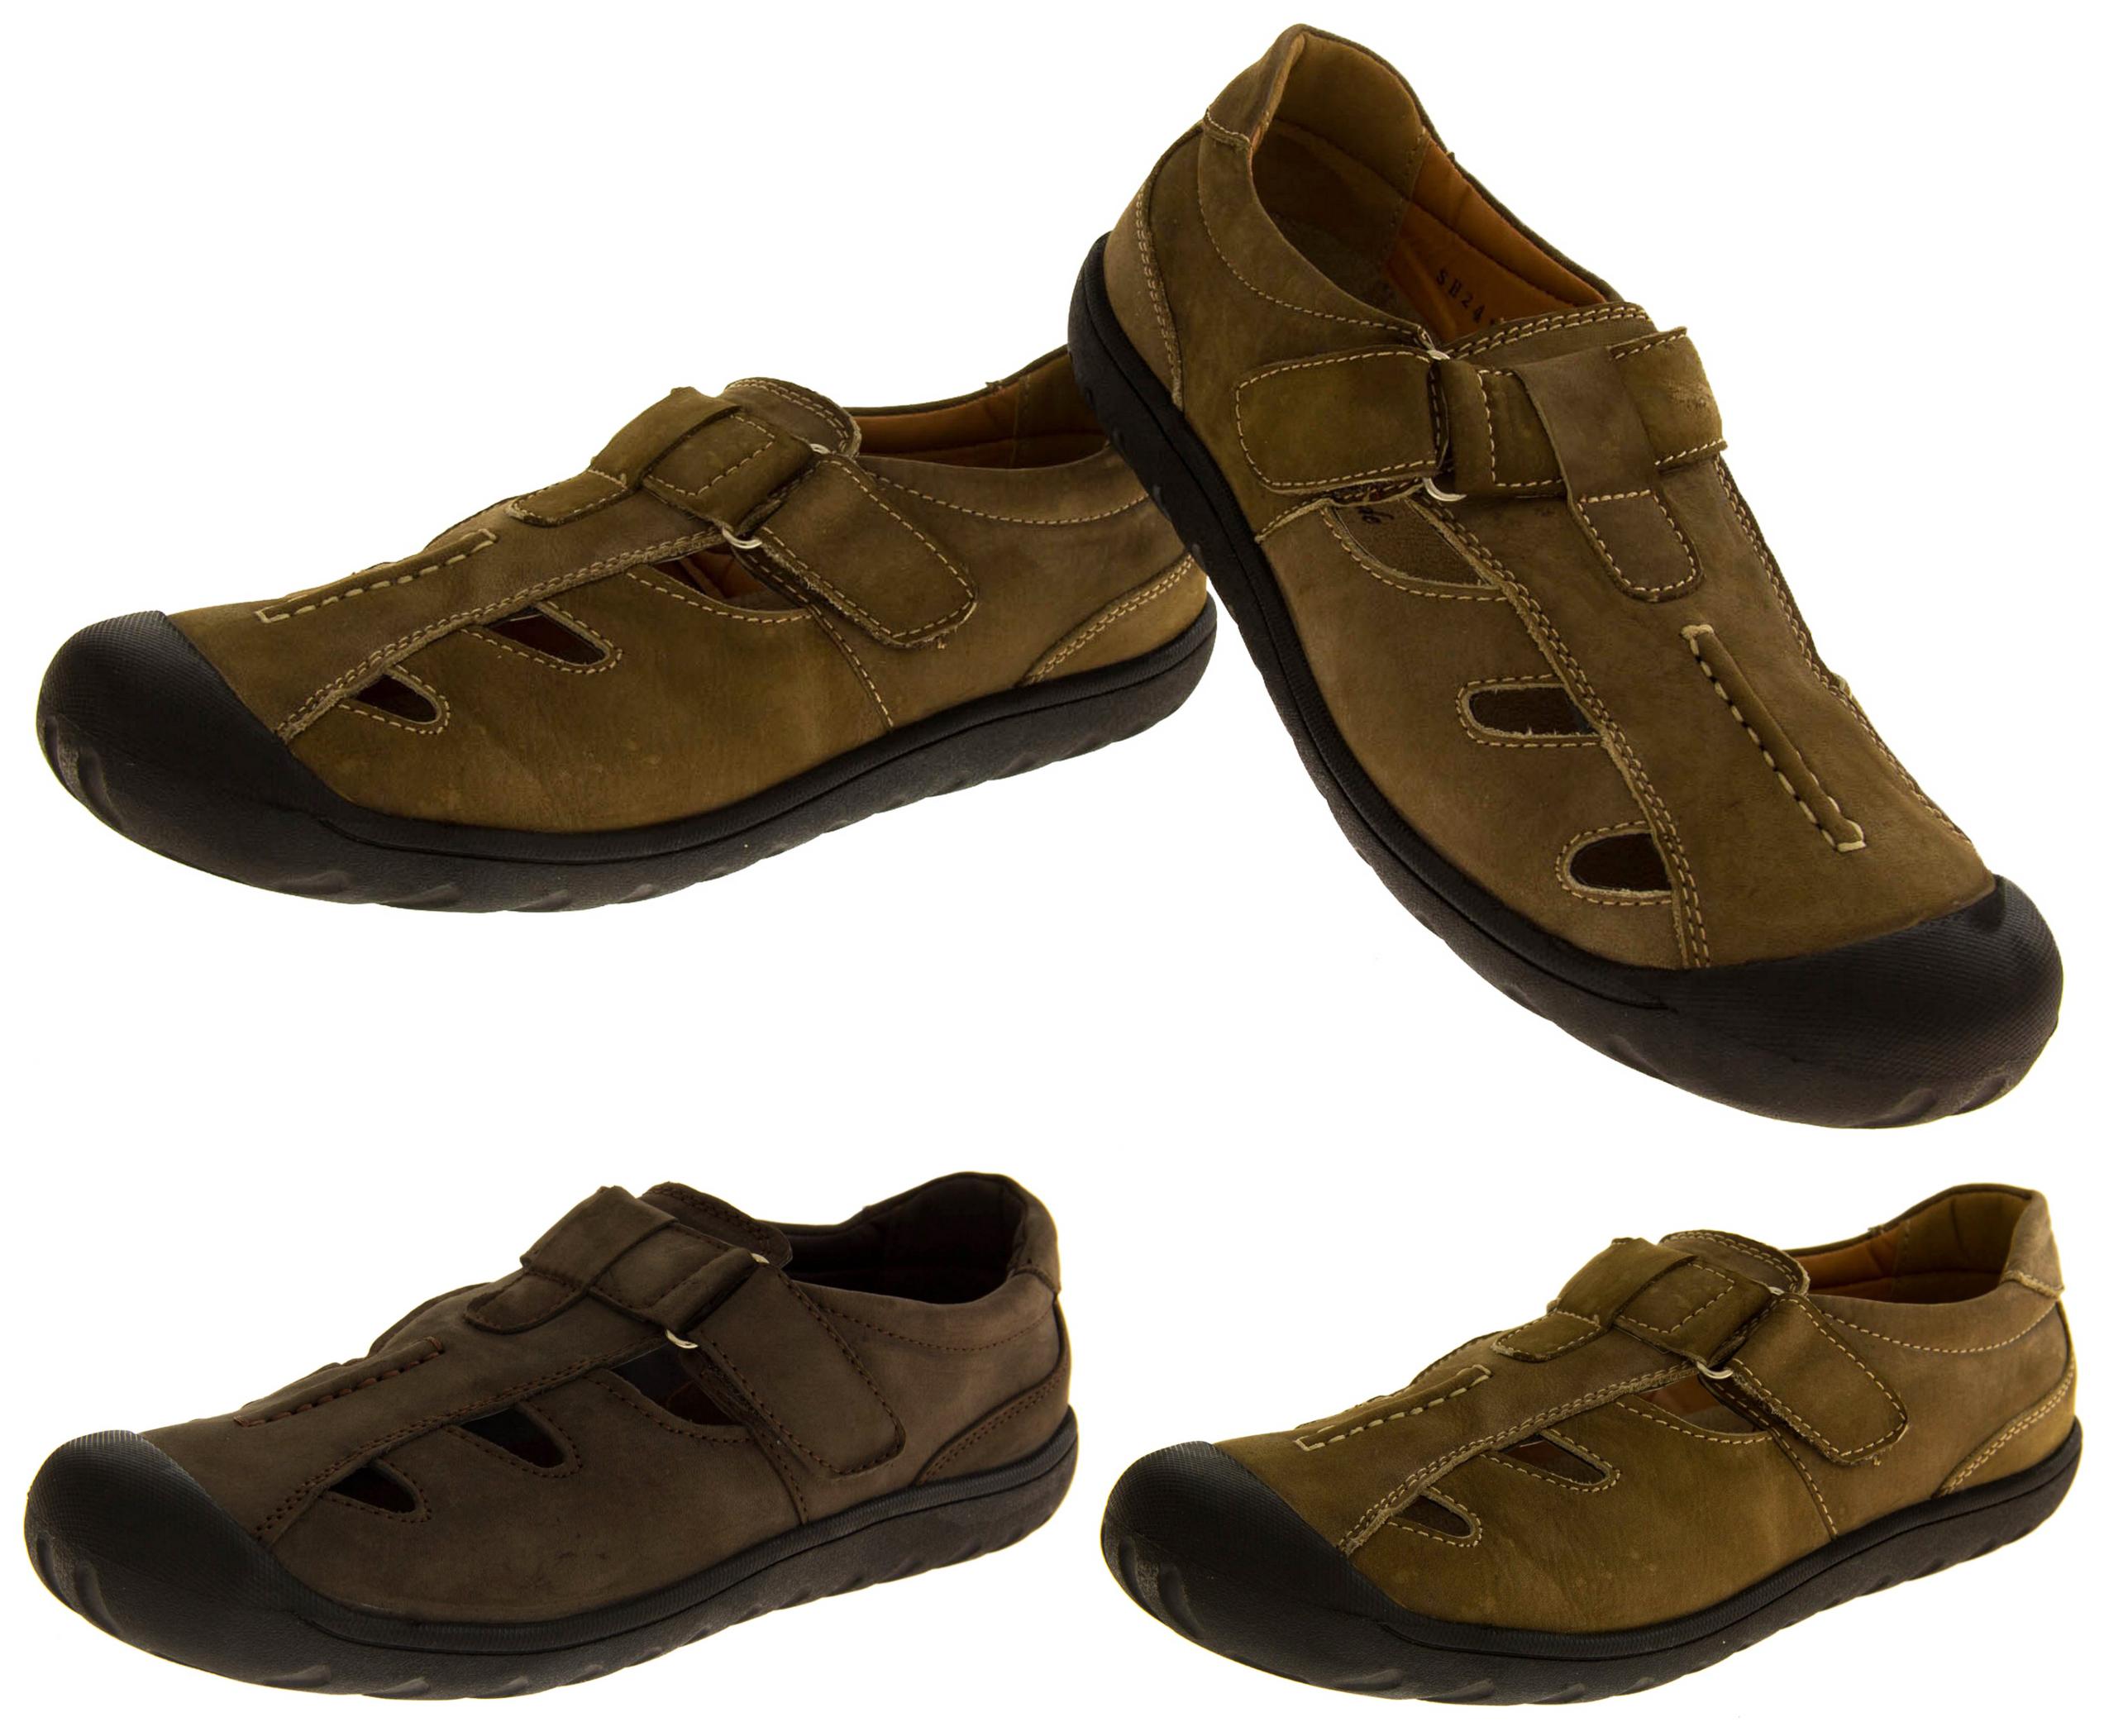 shoreside herren leder geschlossen wander outdoor sport freizeit sommer sandalen ebay. Black Bedroom Furniture Sets. Home Design Ideas